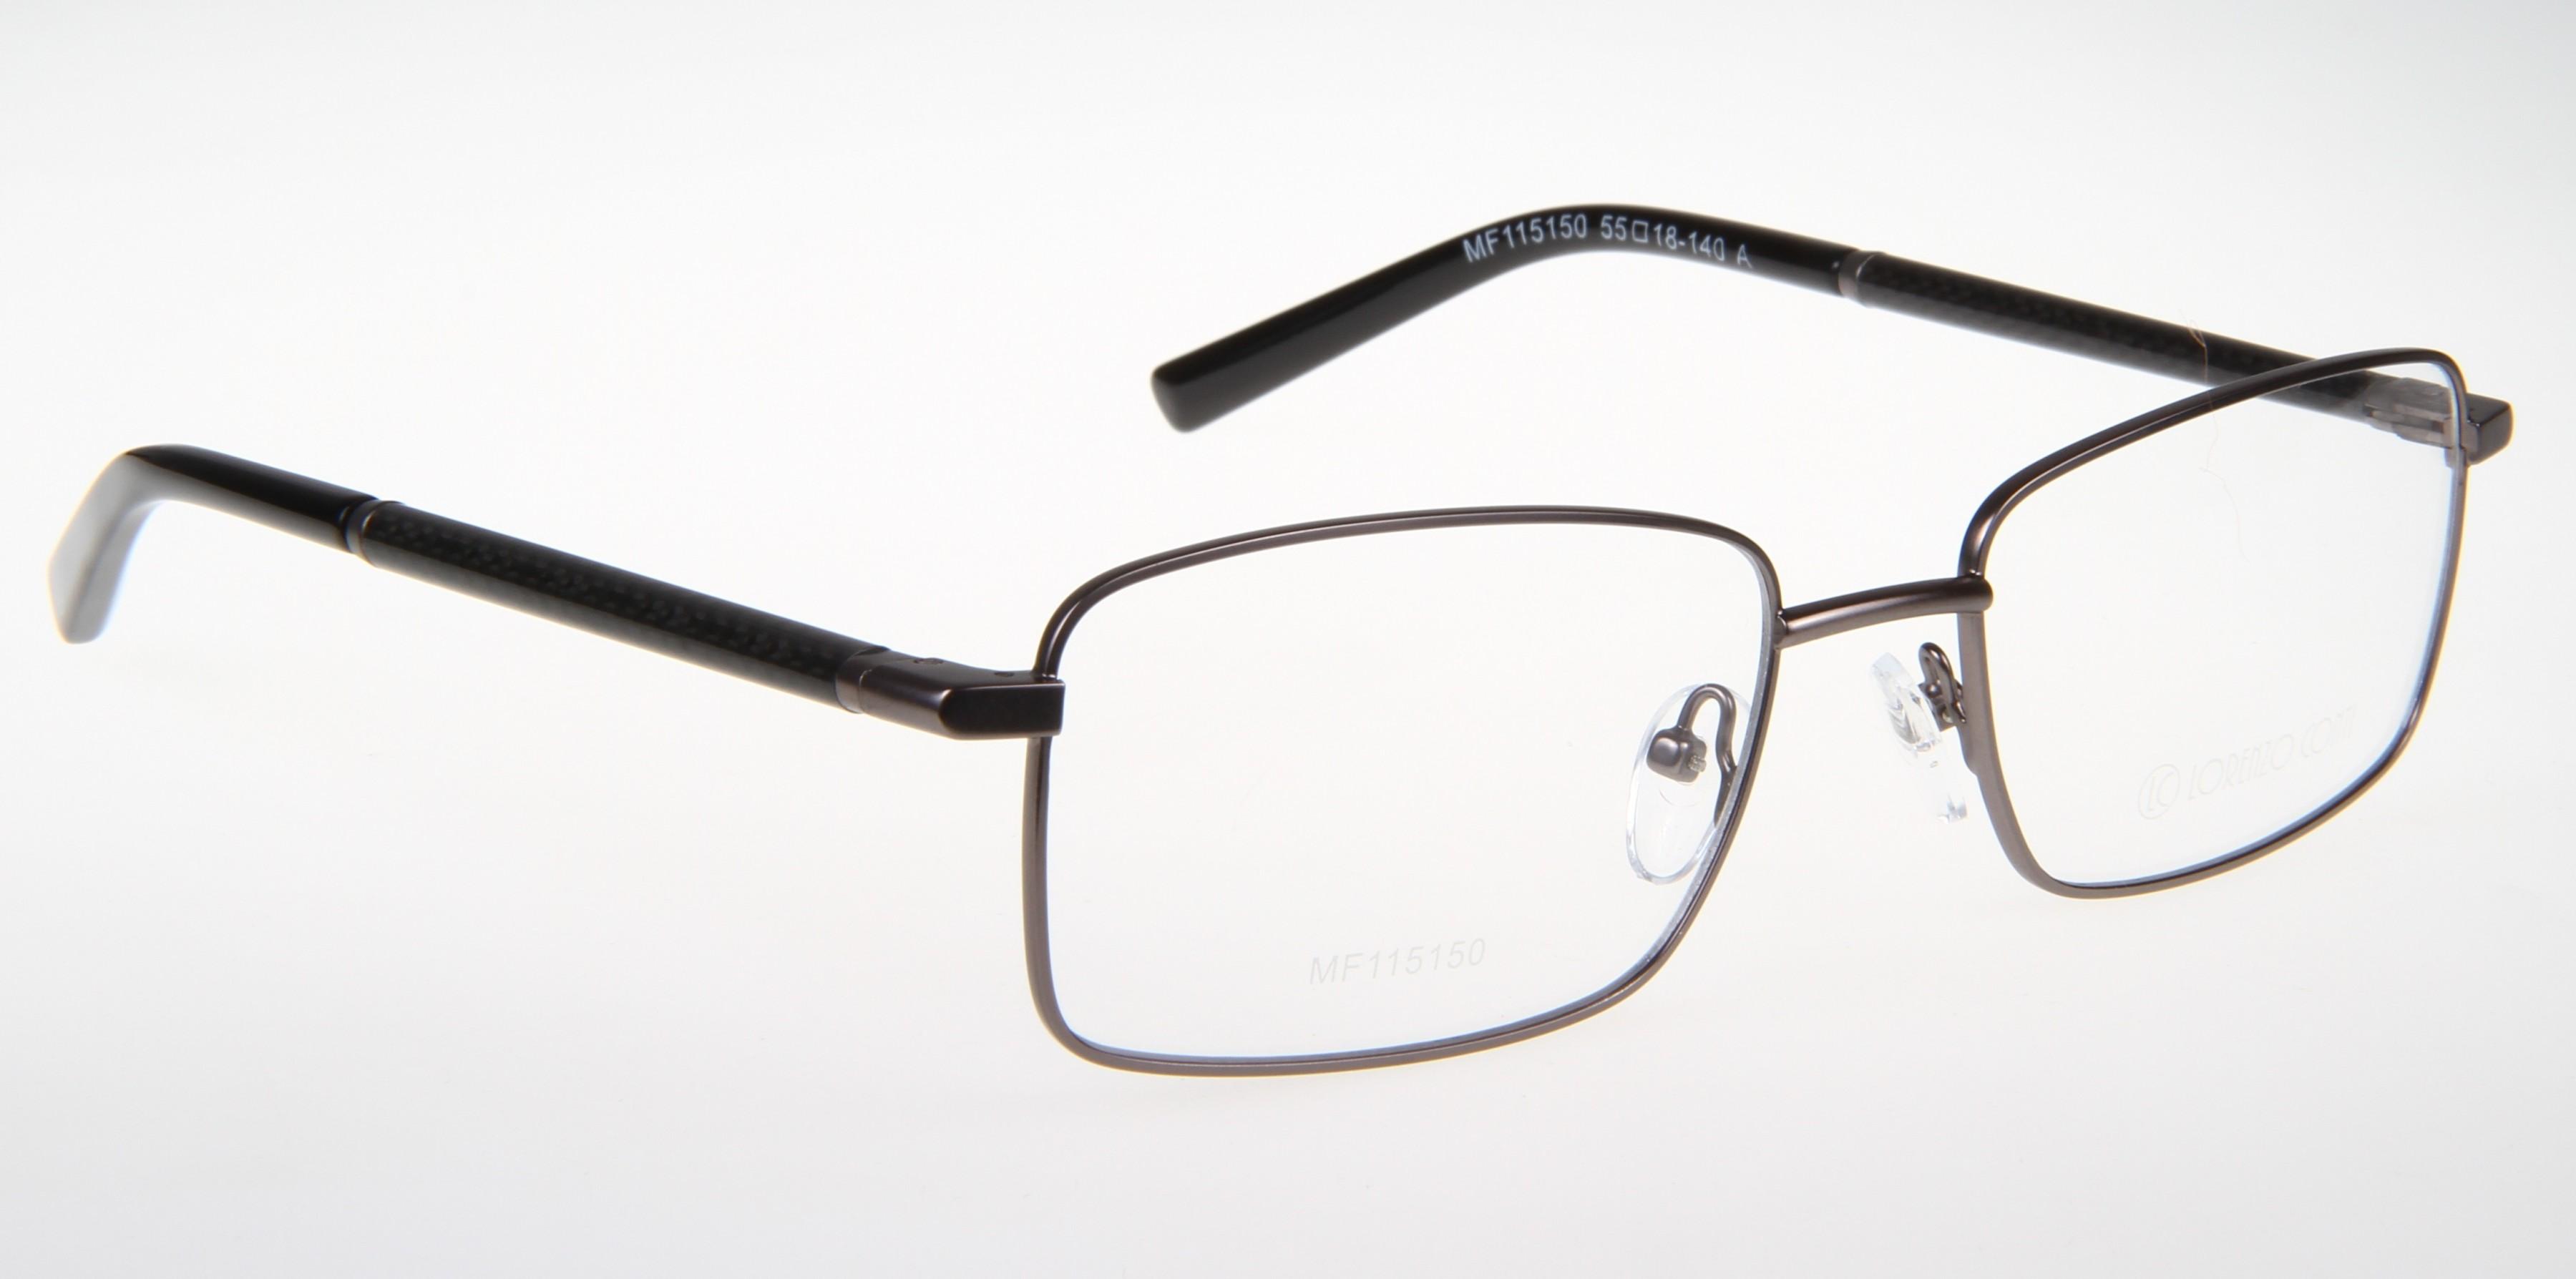 Oprawki okularowe Lorenzo MF115150 col. A srebrny